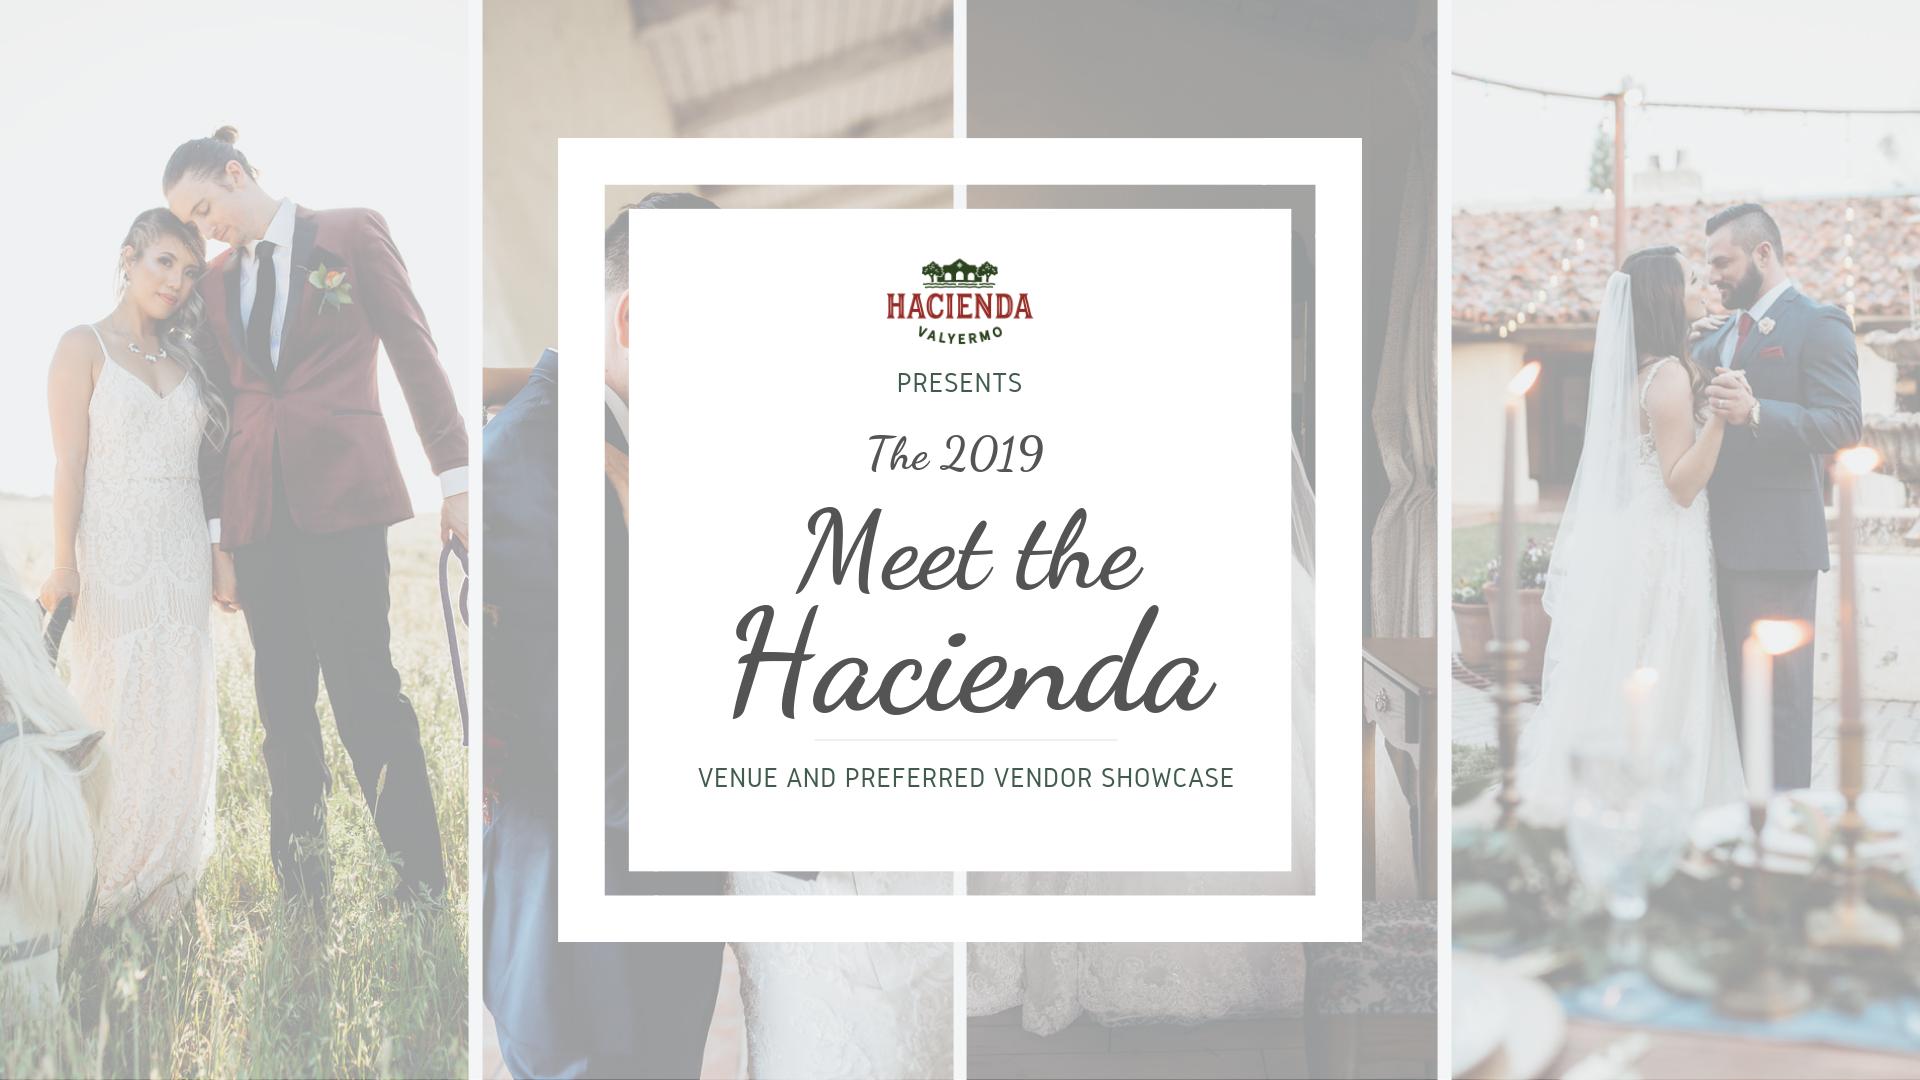 2019 Meet the Hacienda - Facebook Event Cover.png